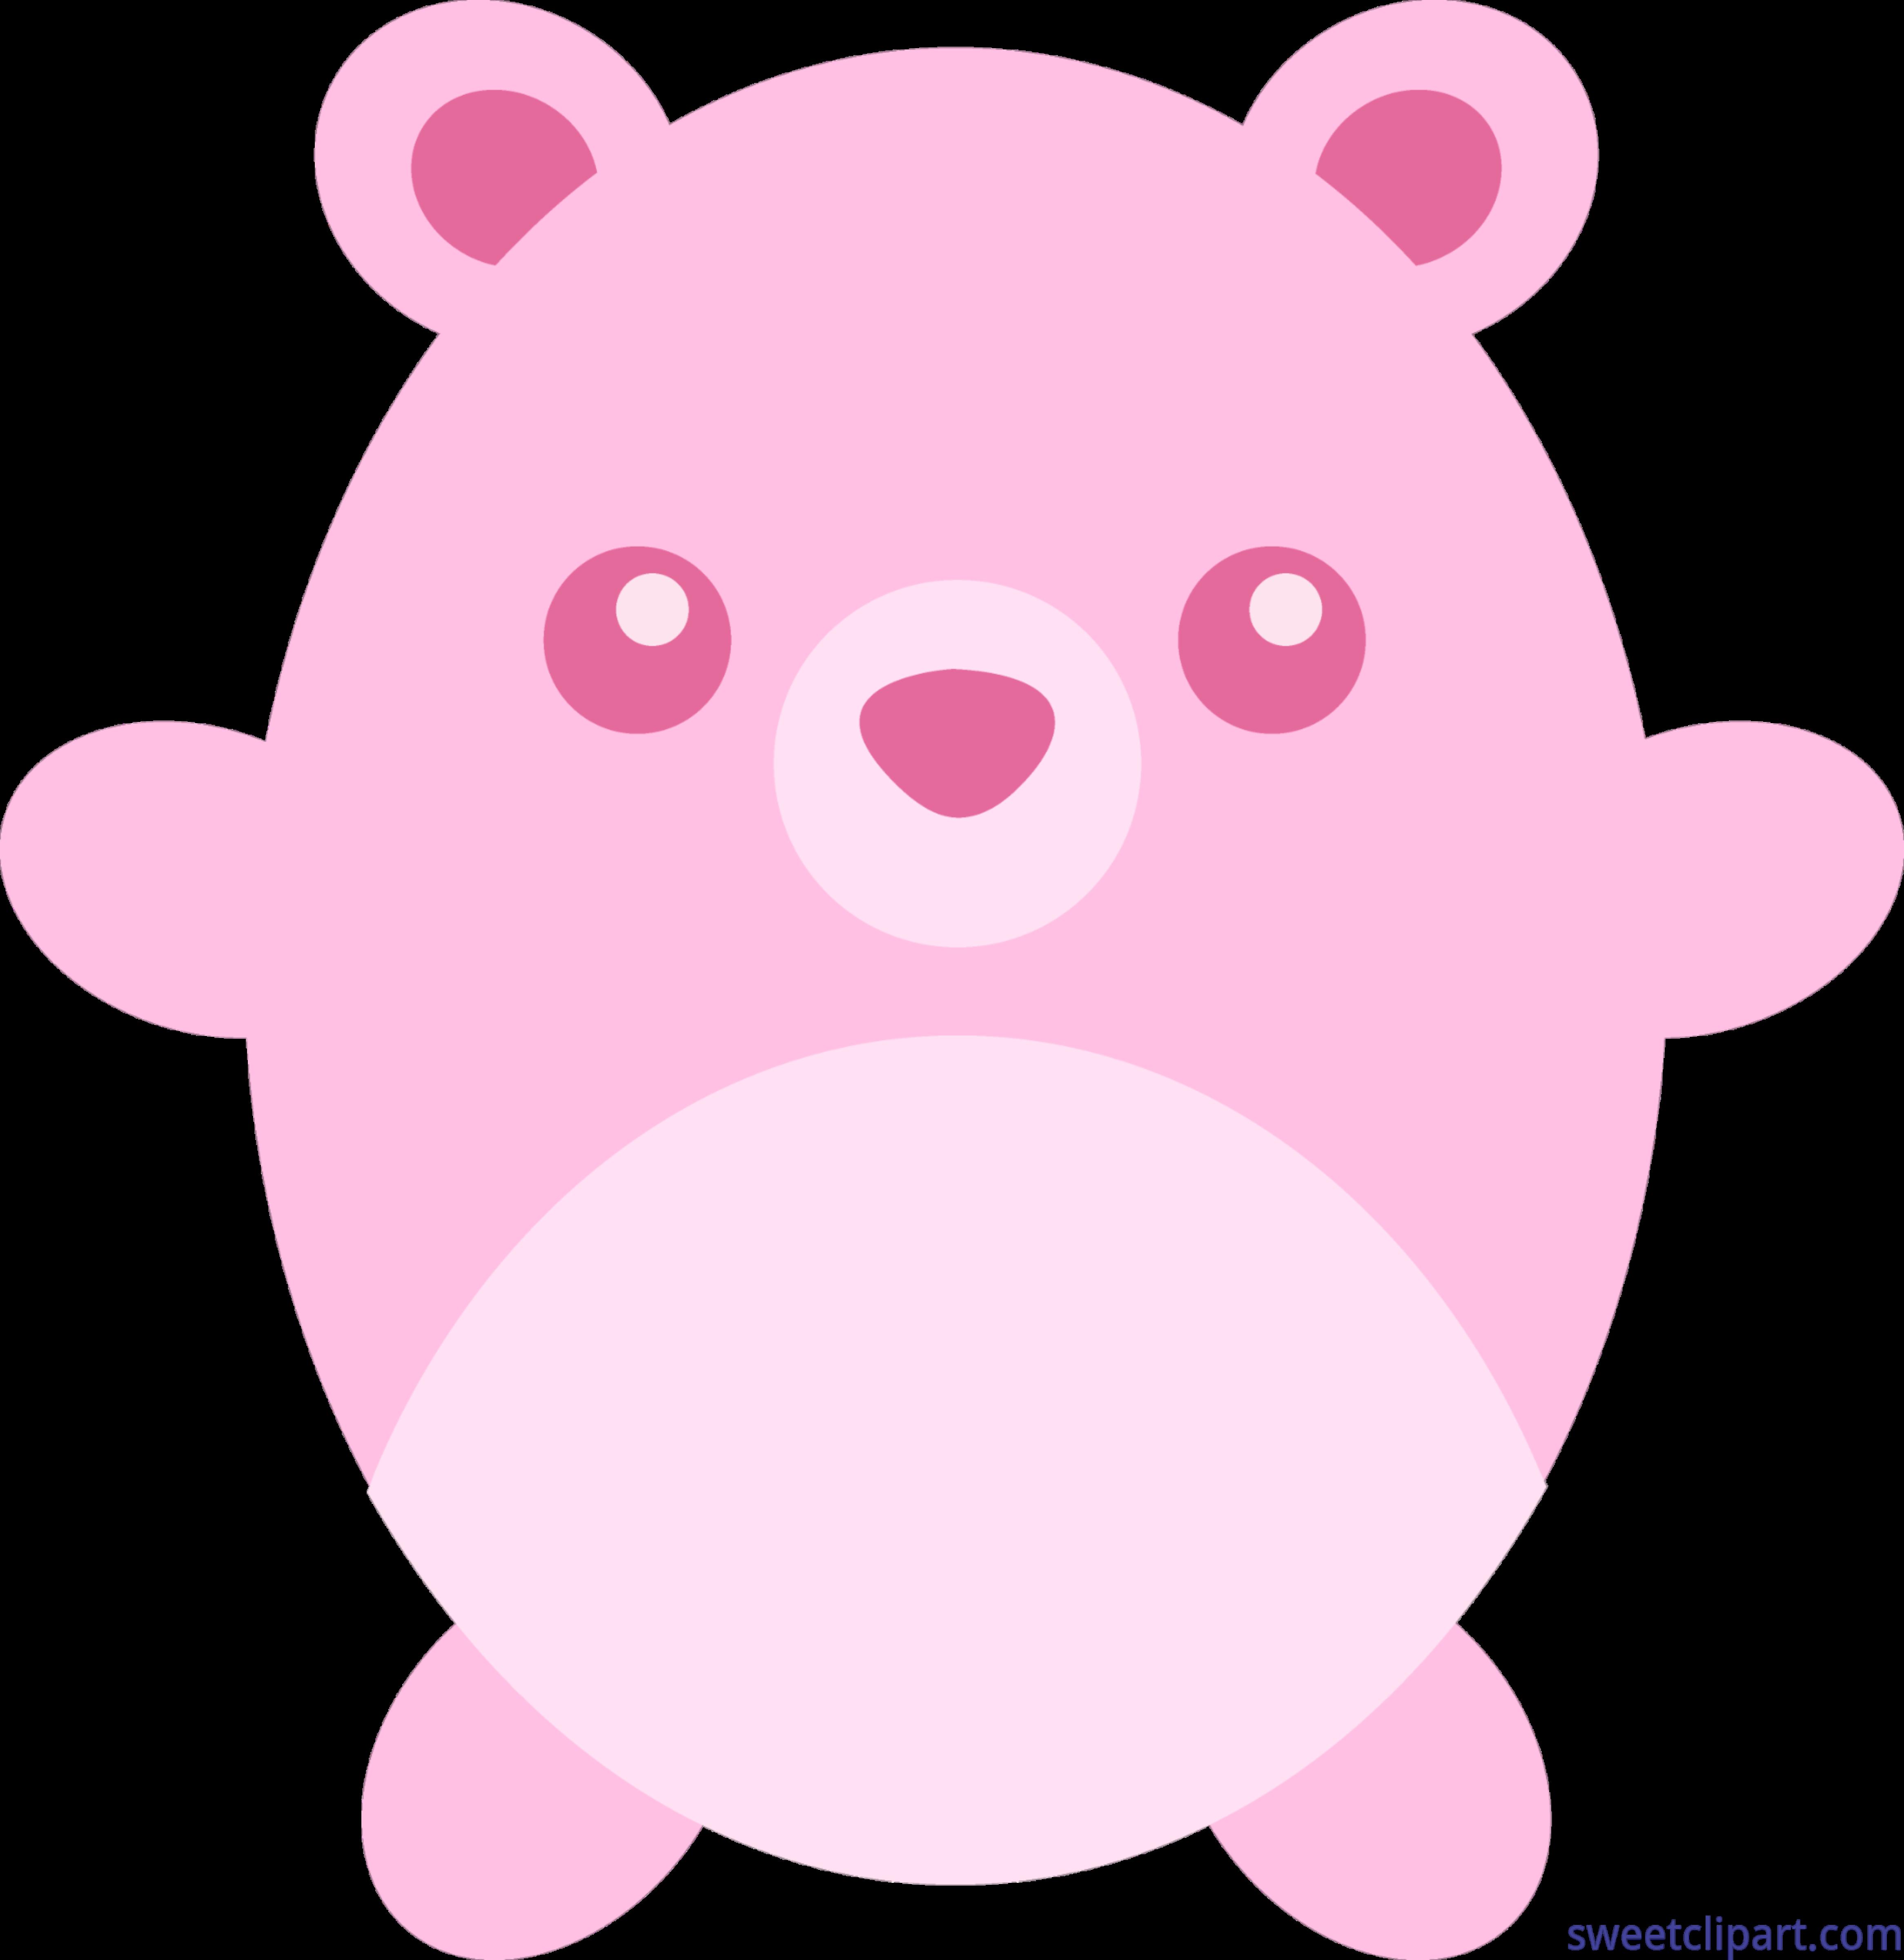 Round pink clip art. Medical clipart teddy bear